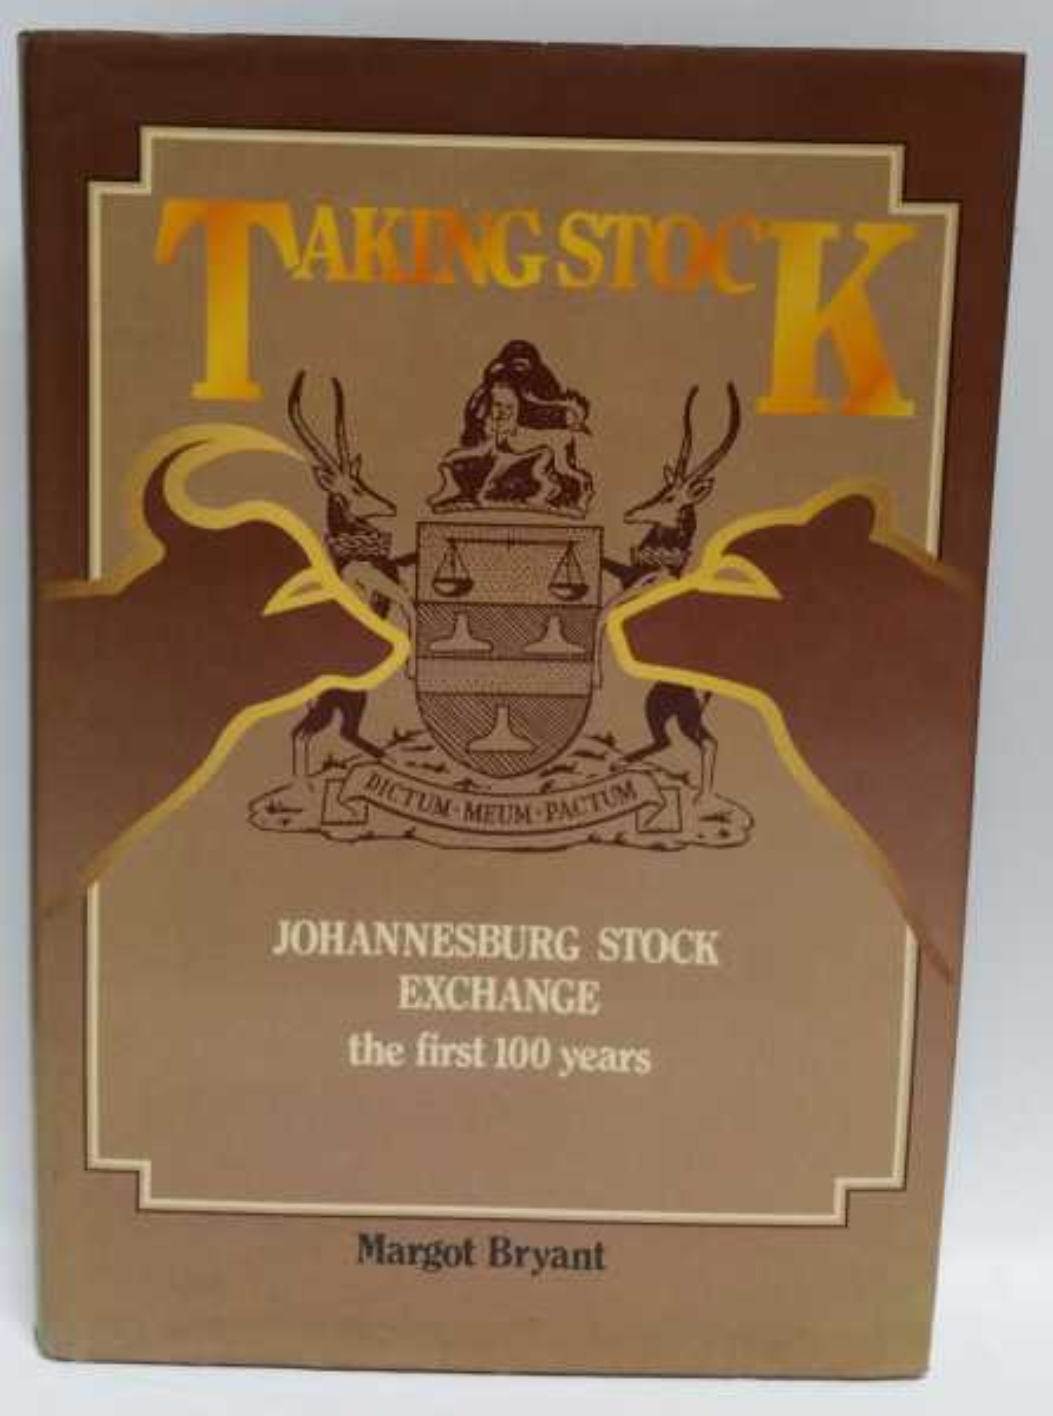 Taking Stock: Johannesburg Stock Exchange: the first 100 years, Margot Bryant